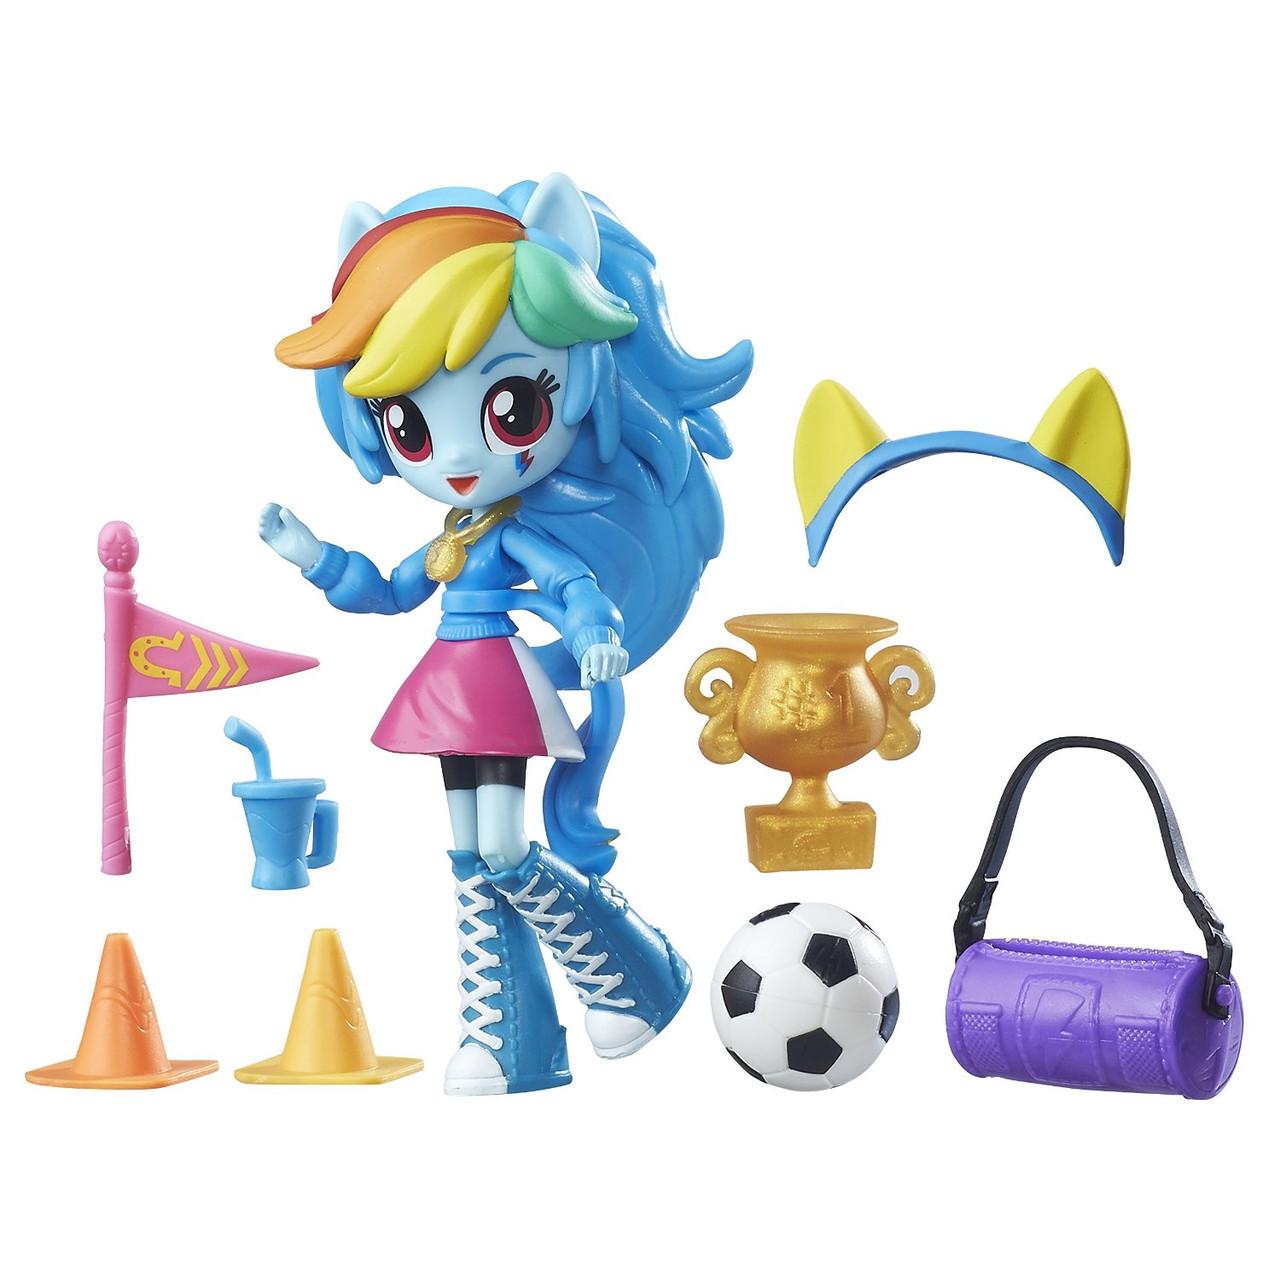 My Little Pony Equestria Girls девочки эквестрии рейнбоу деш